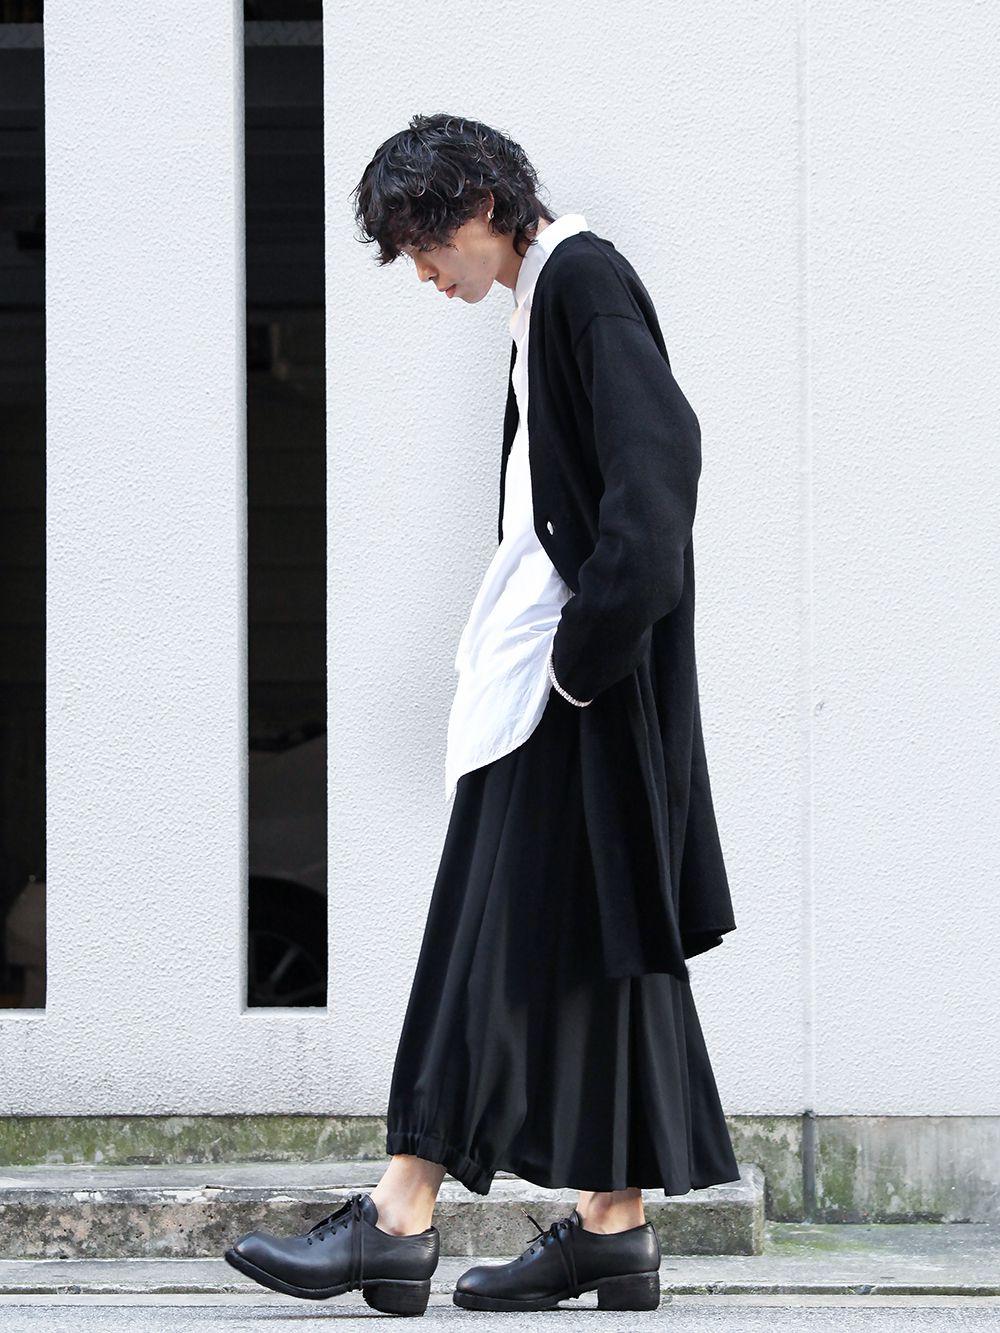 Yohji Yamamoto 19-20AW collection New Arrivals!! - 2-002